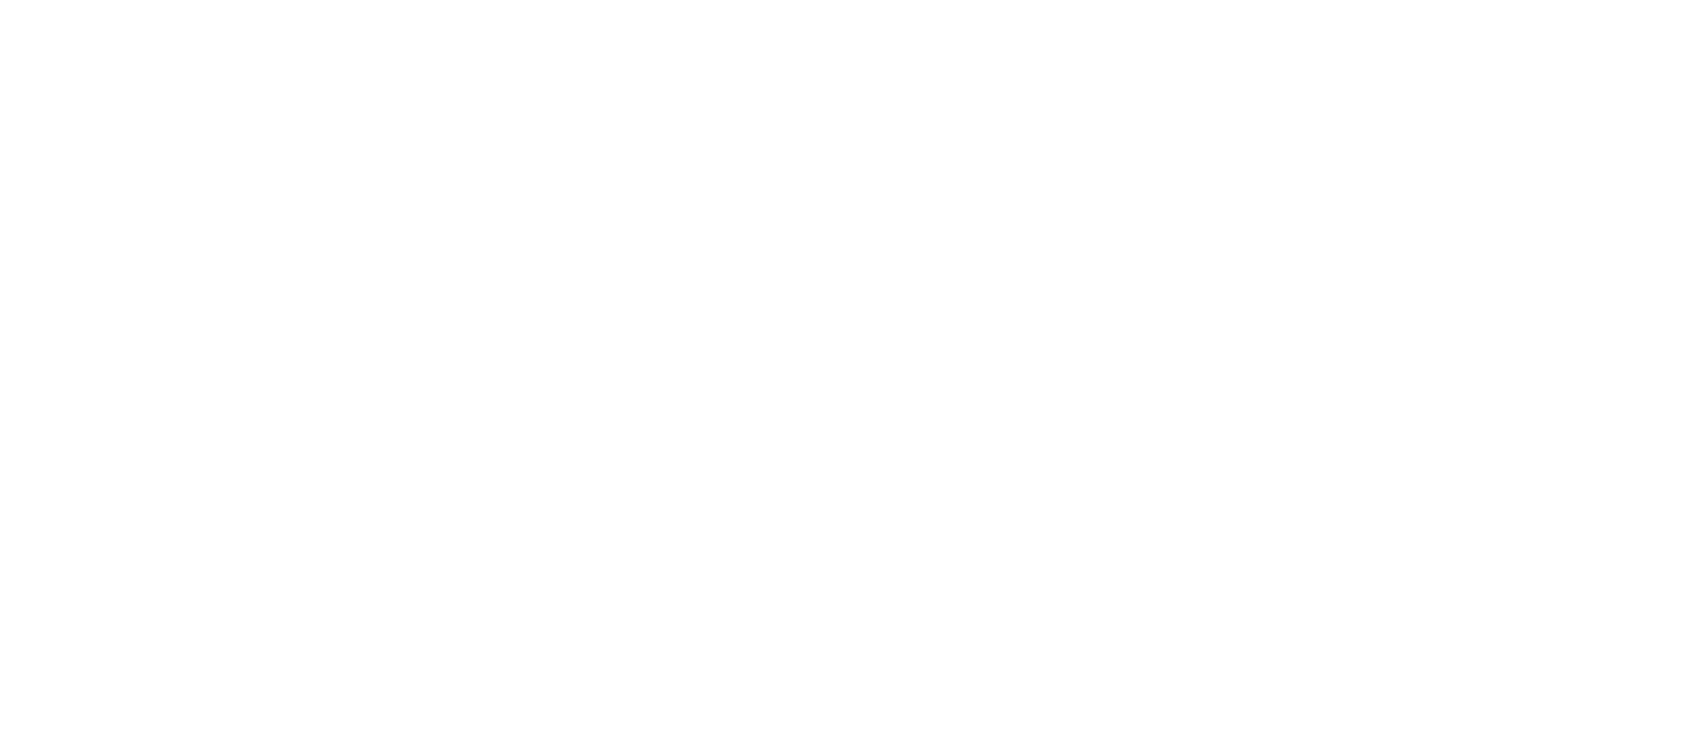 Hurin Seguridad Electronica